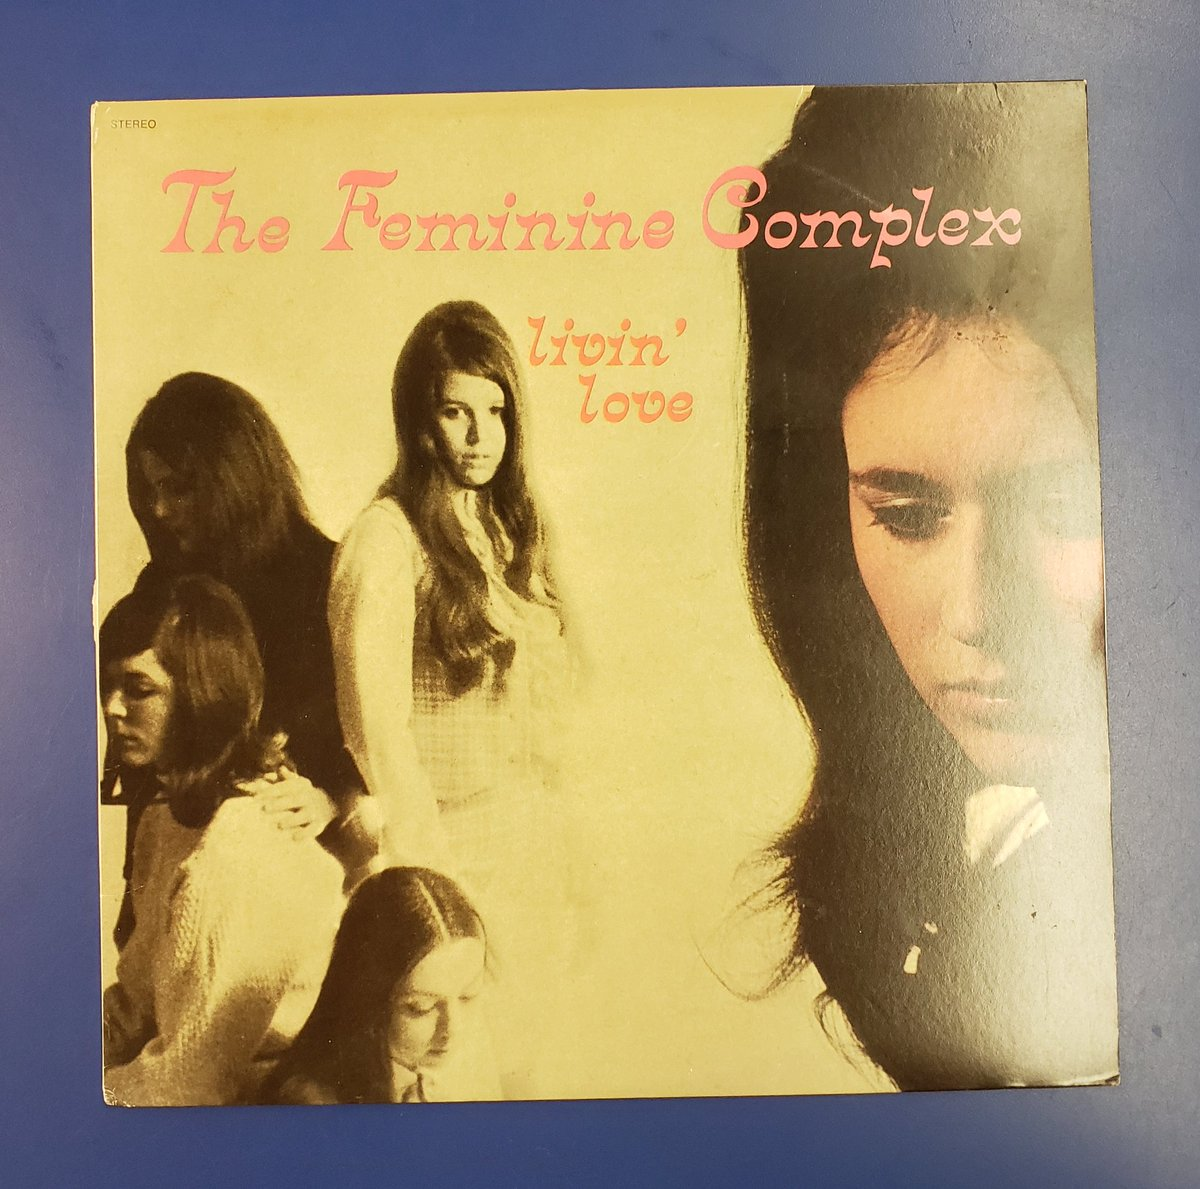 RT @SonicBoomSpins: Feminine Complex - Livin' Love #NowPlaying #vinylrecords https://t.co/yA7WYJeIuc